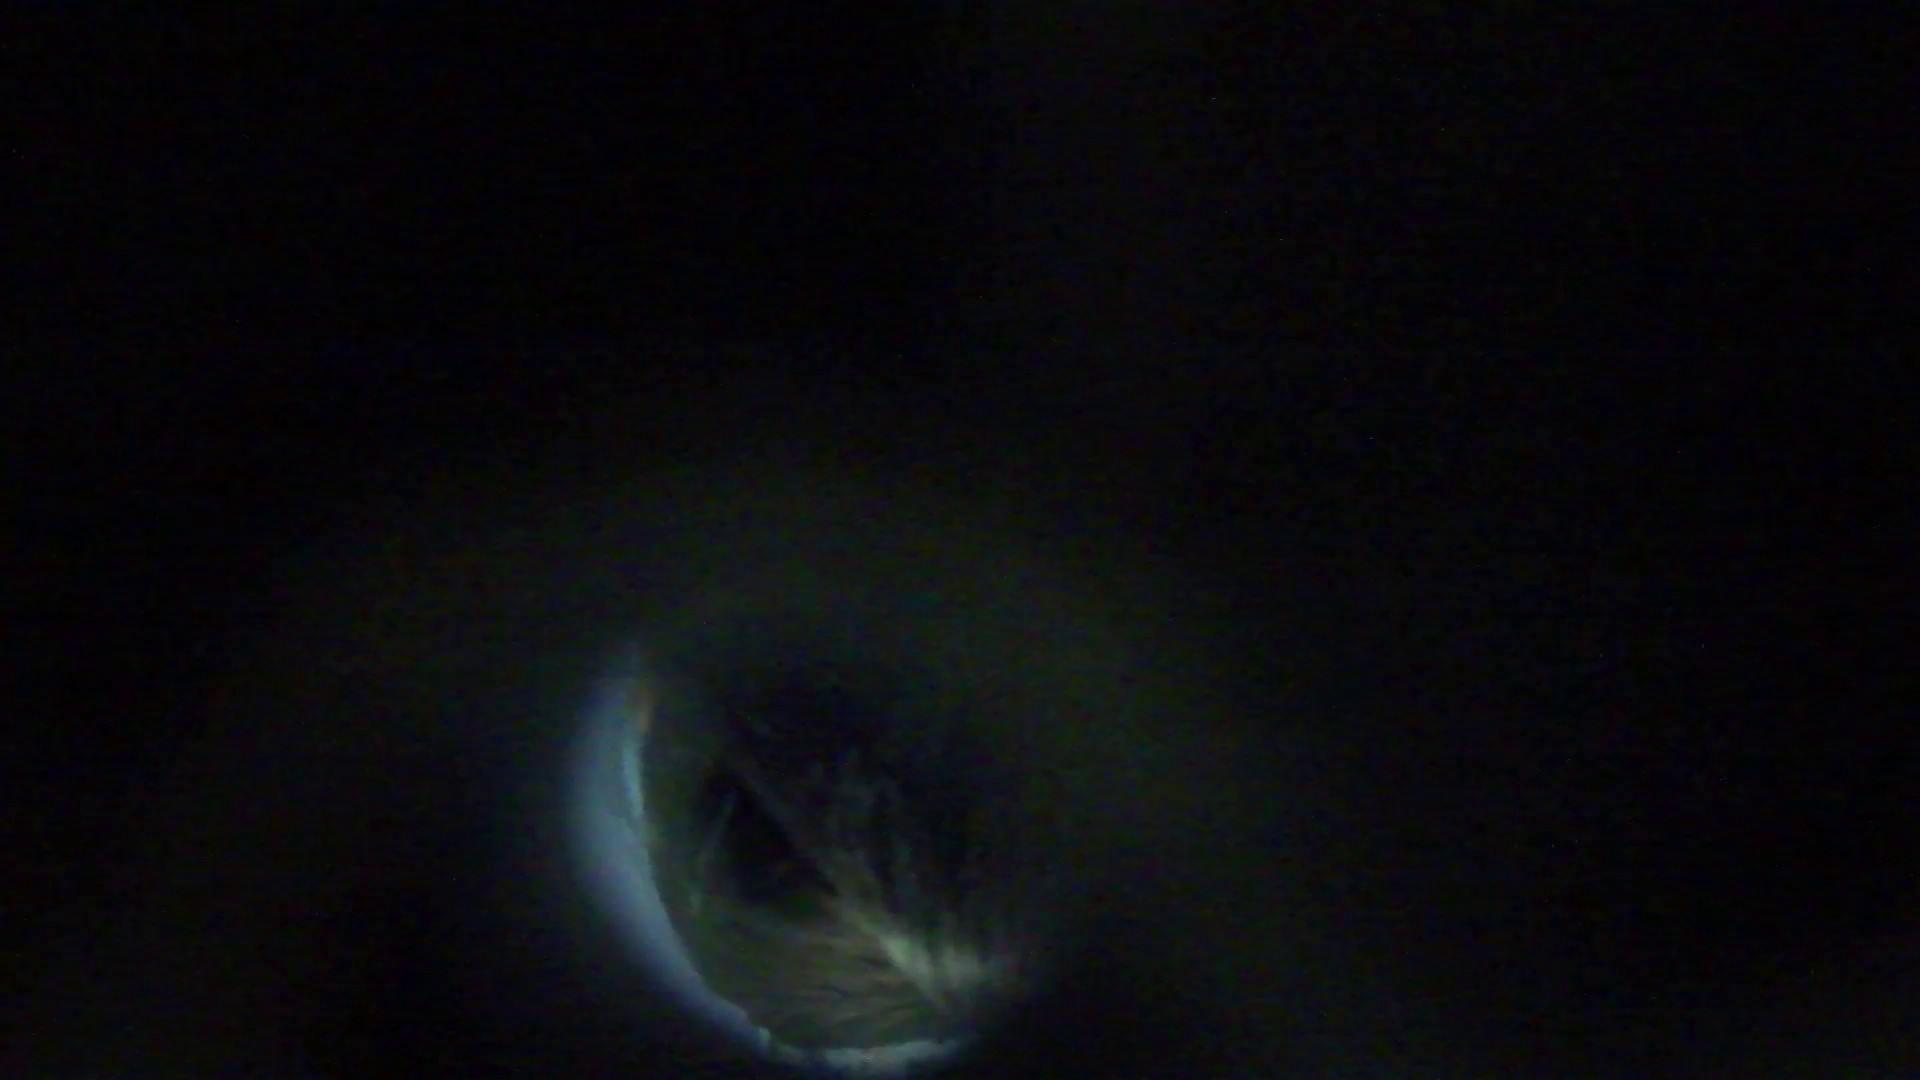 JD盗撮 美女の洗面所の秘密 Vol.78 盛合せ エロ画像 89画像 63